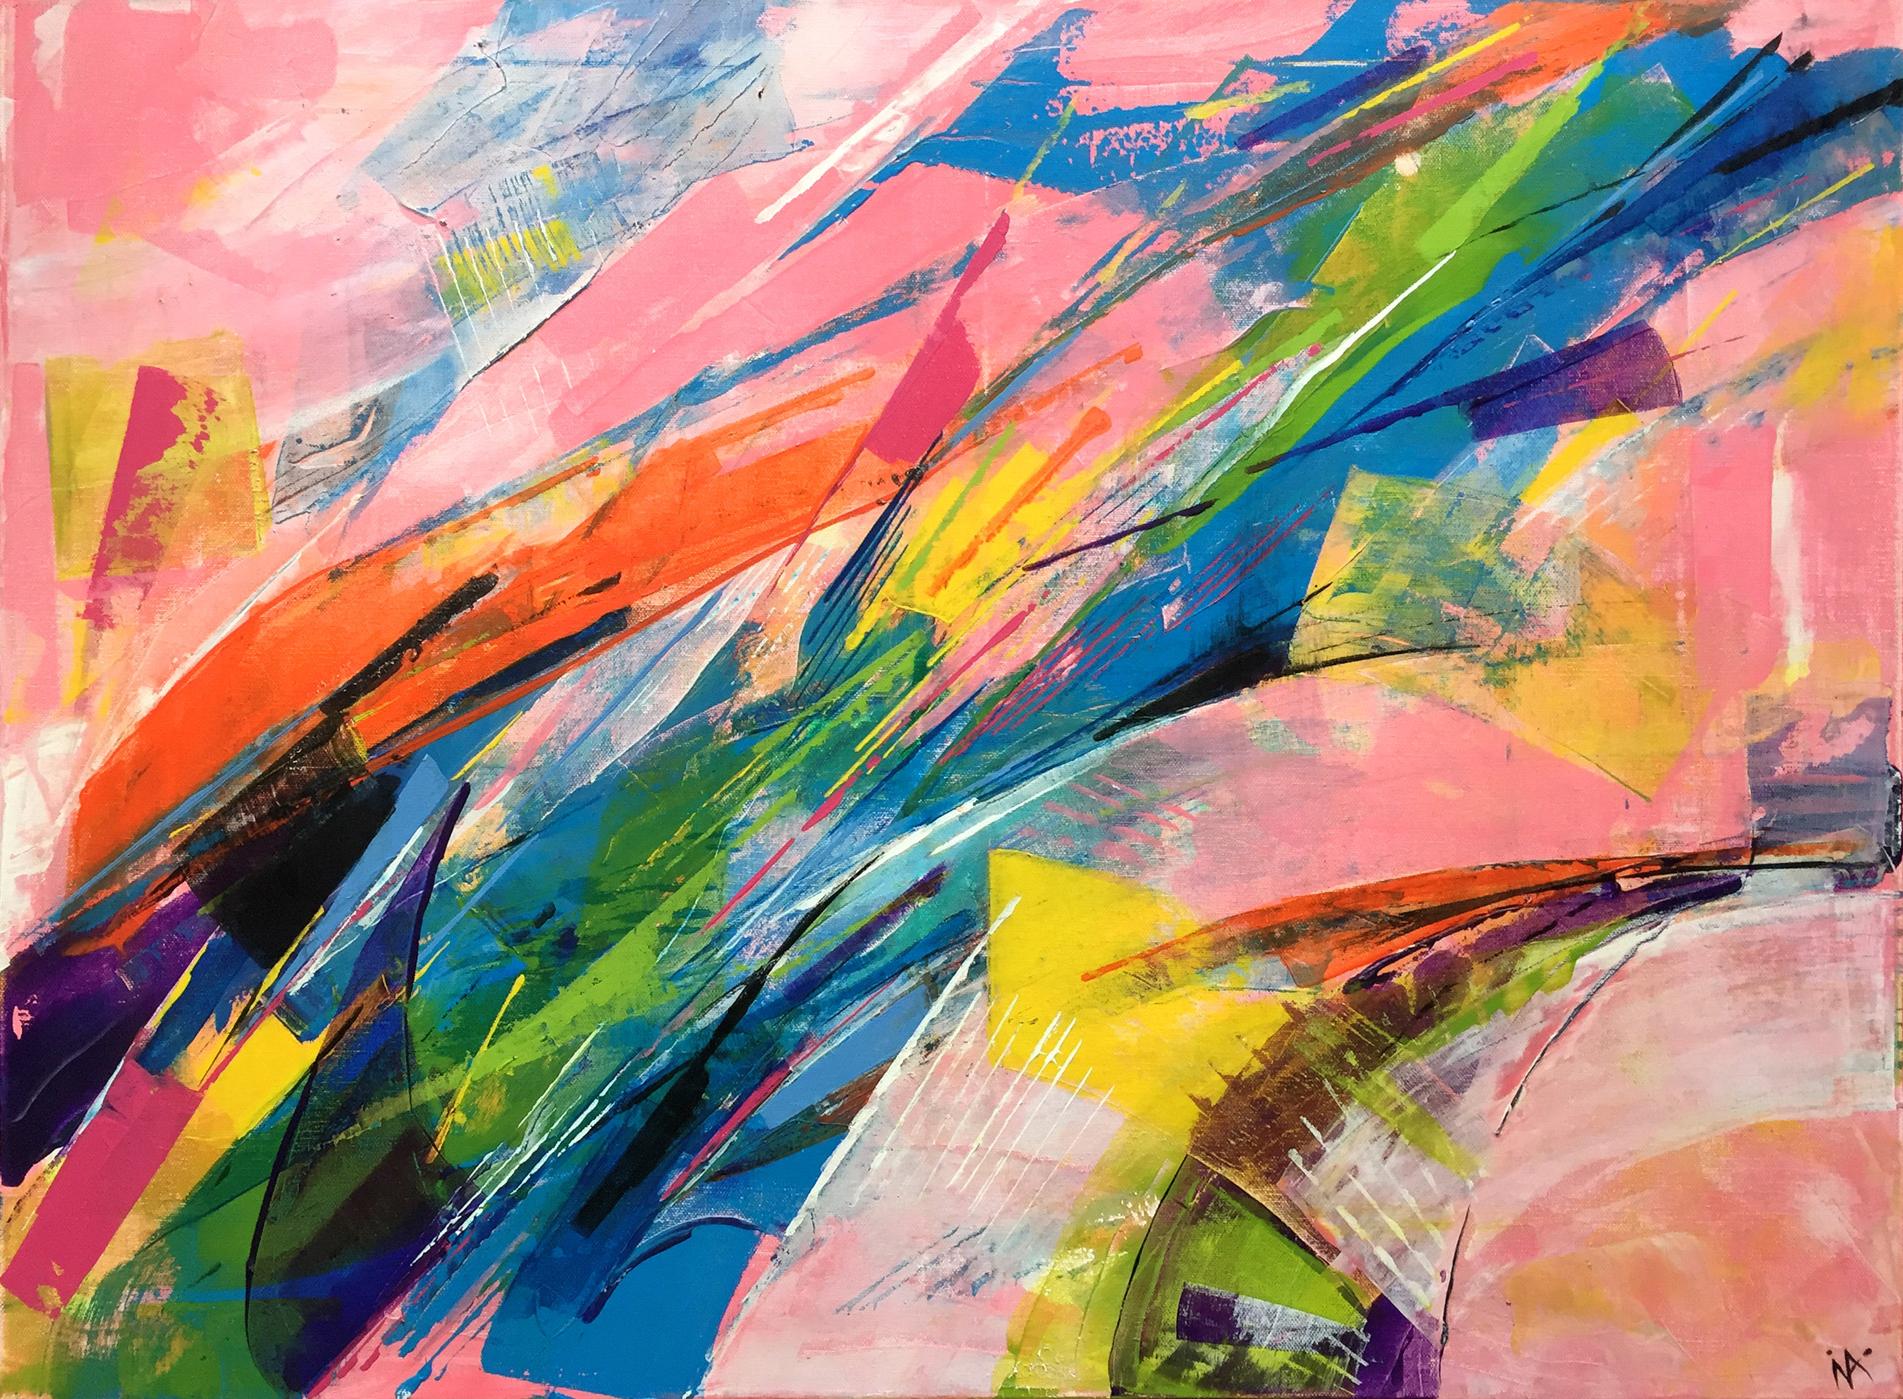 Ina Prodanova | Impression | Acrylic | 69x95cm framed | £610